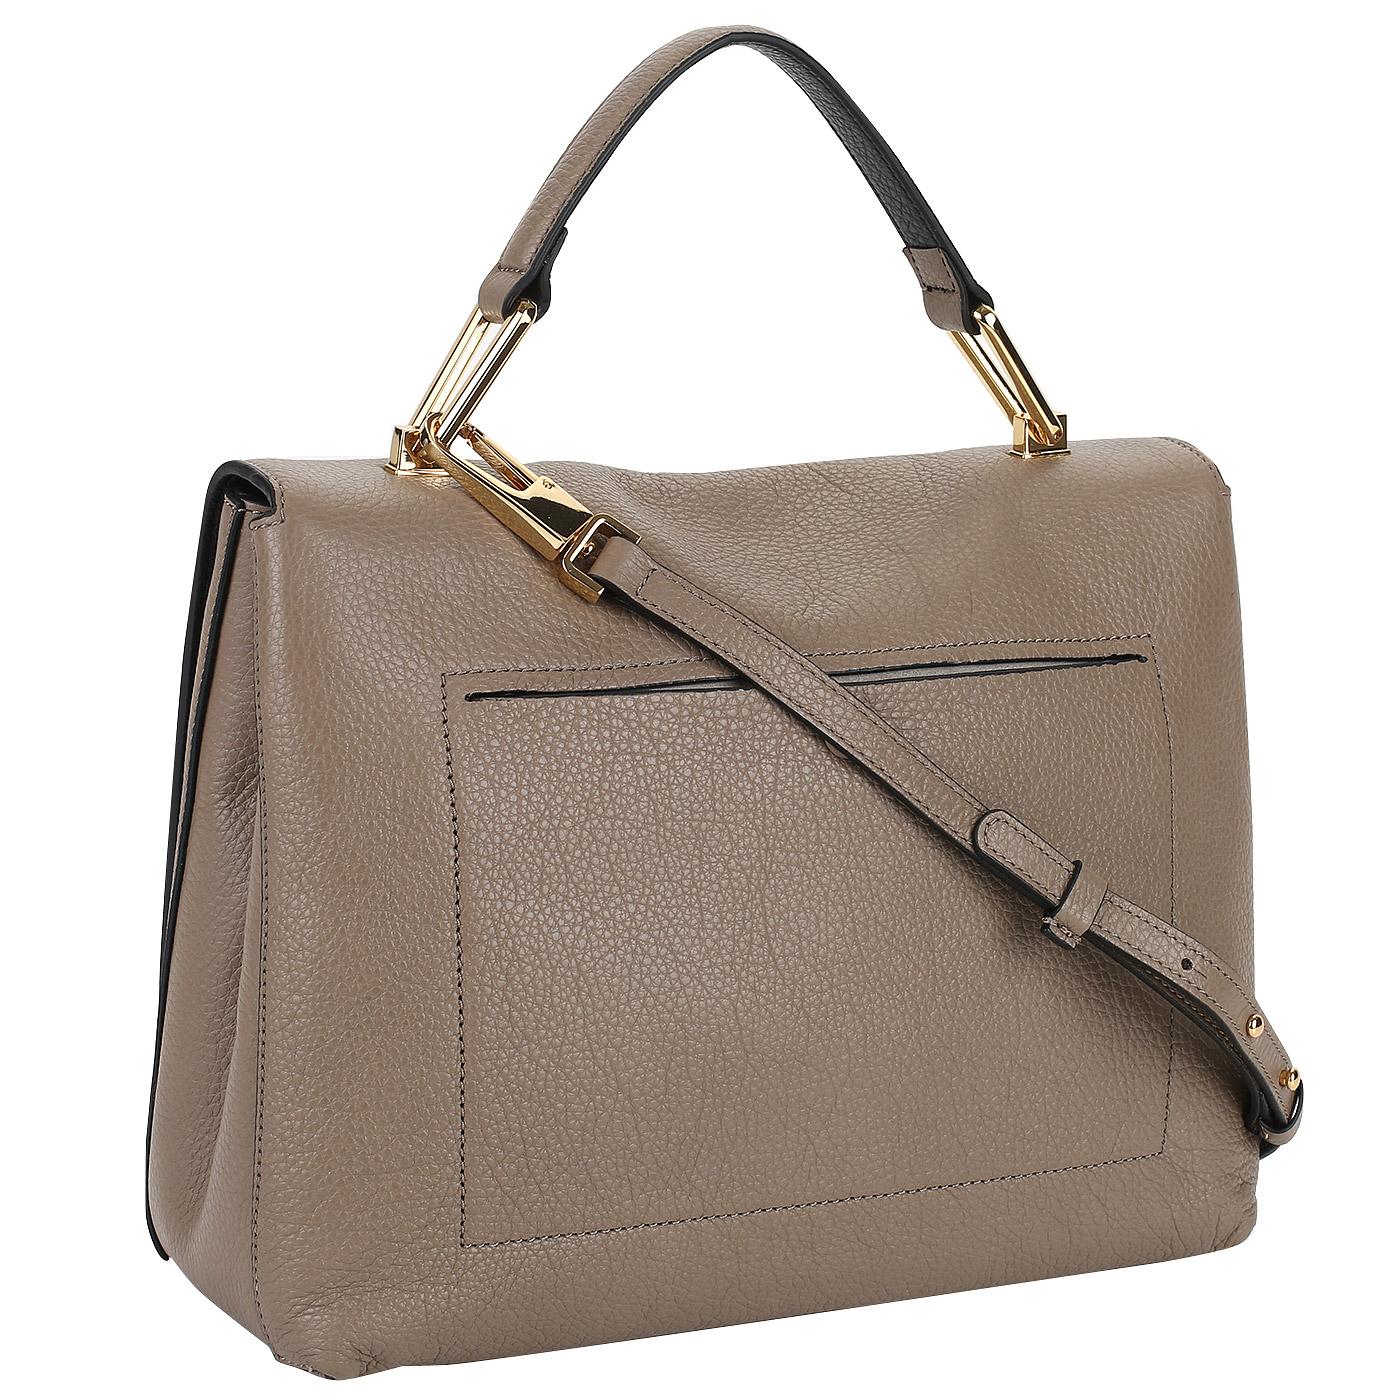 9daab0f0feb4 Кожаная сумка Coccinelle Liya CD0 18 01 01_taupe/nero ...